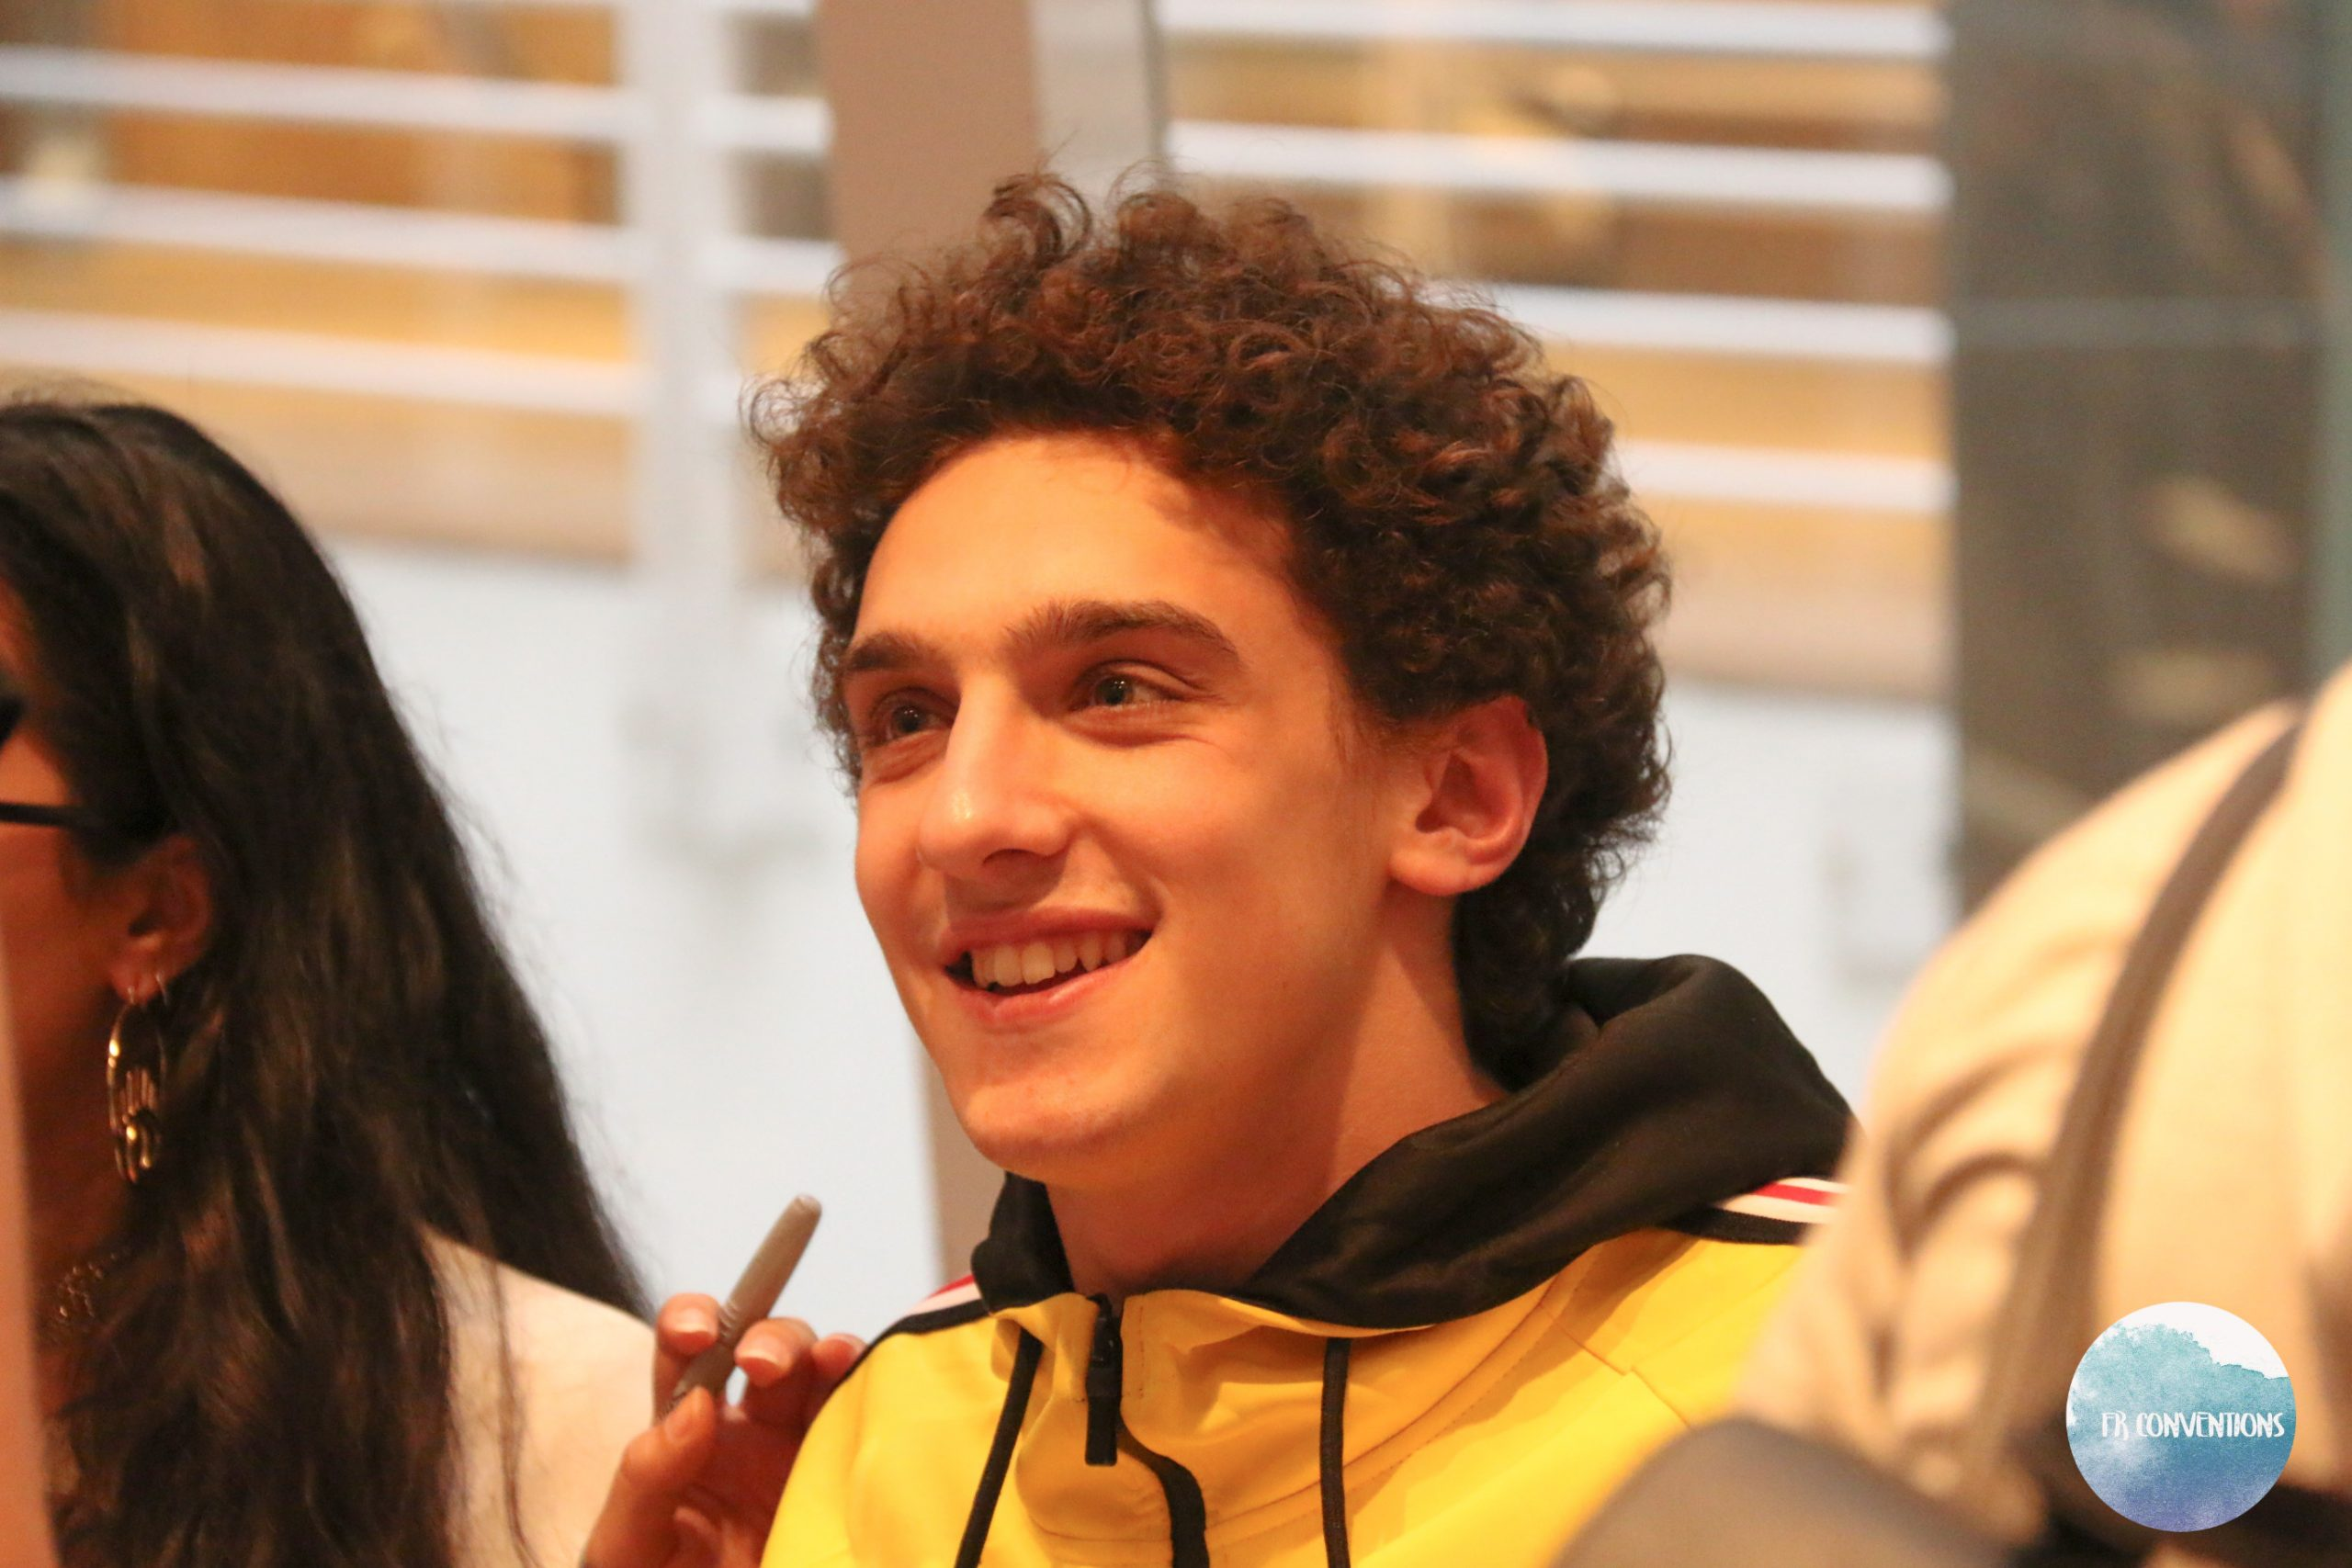 Paul Scarfoglio